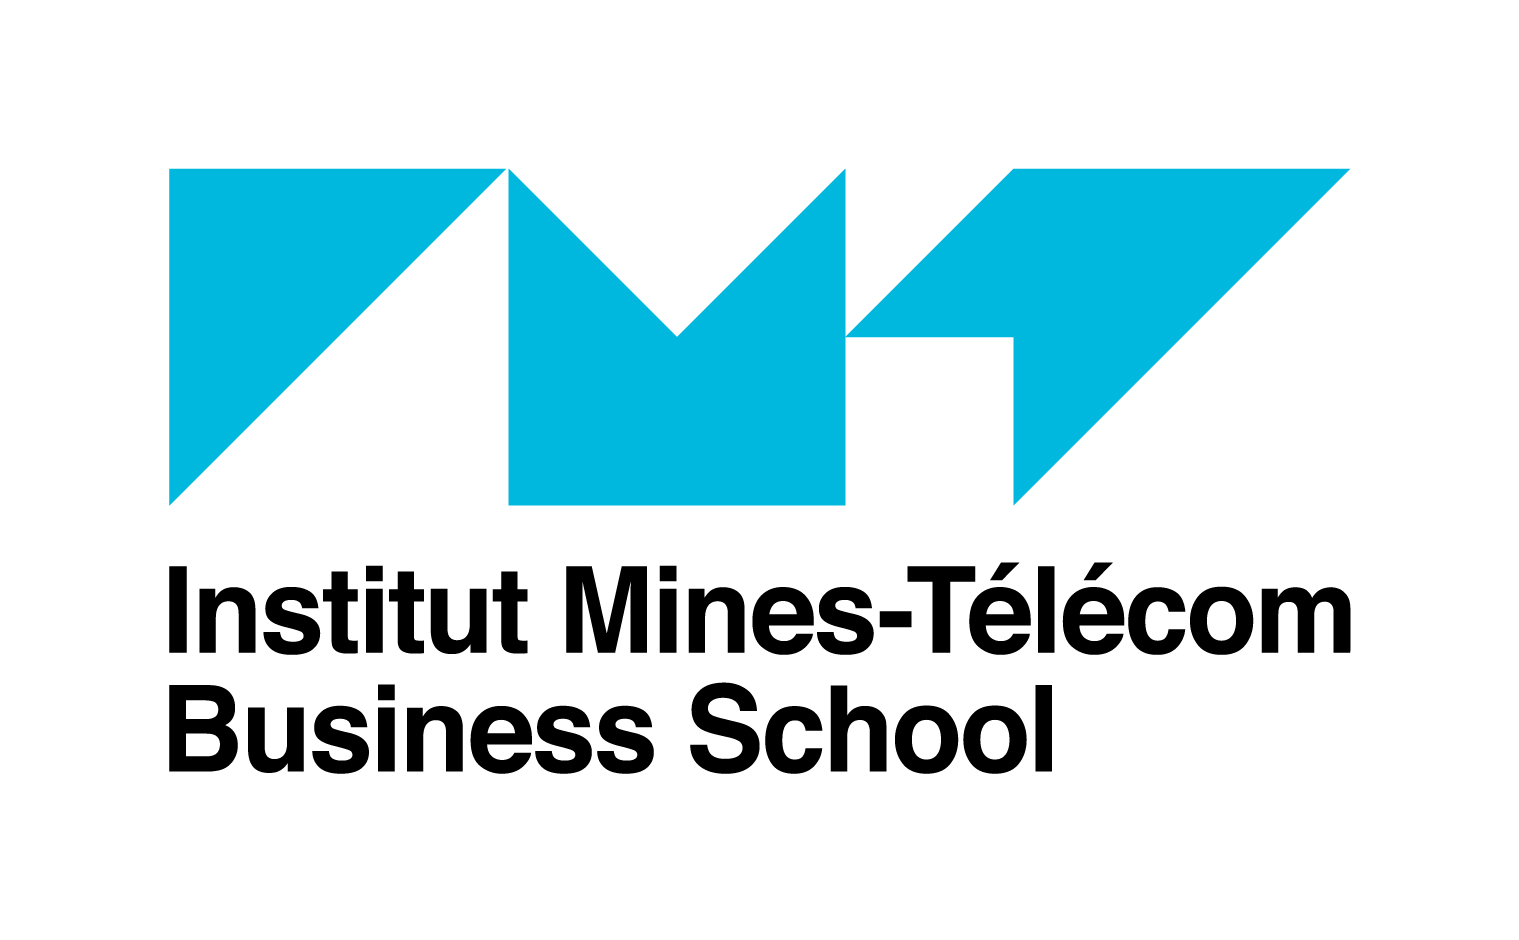 Logo of Institut Mines-Telecom Business School